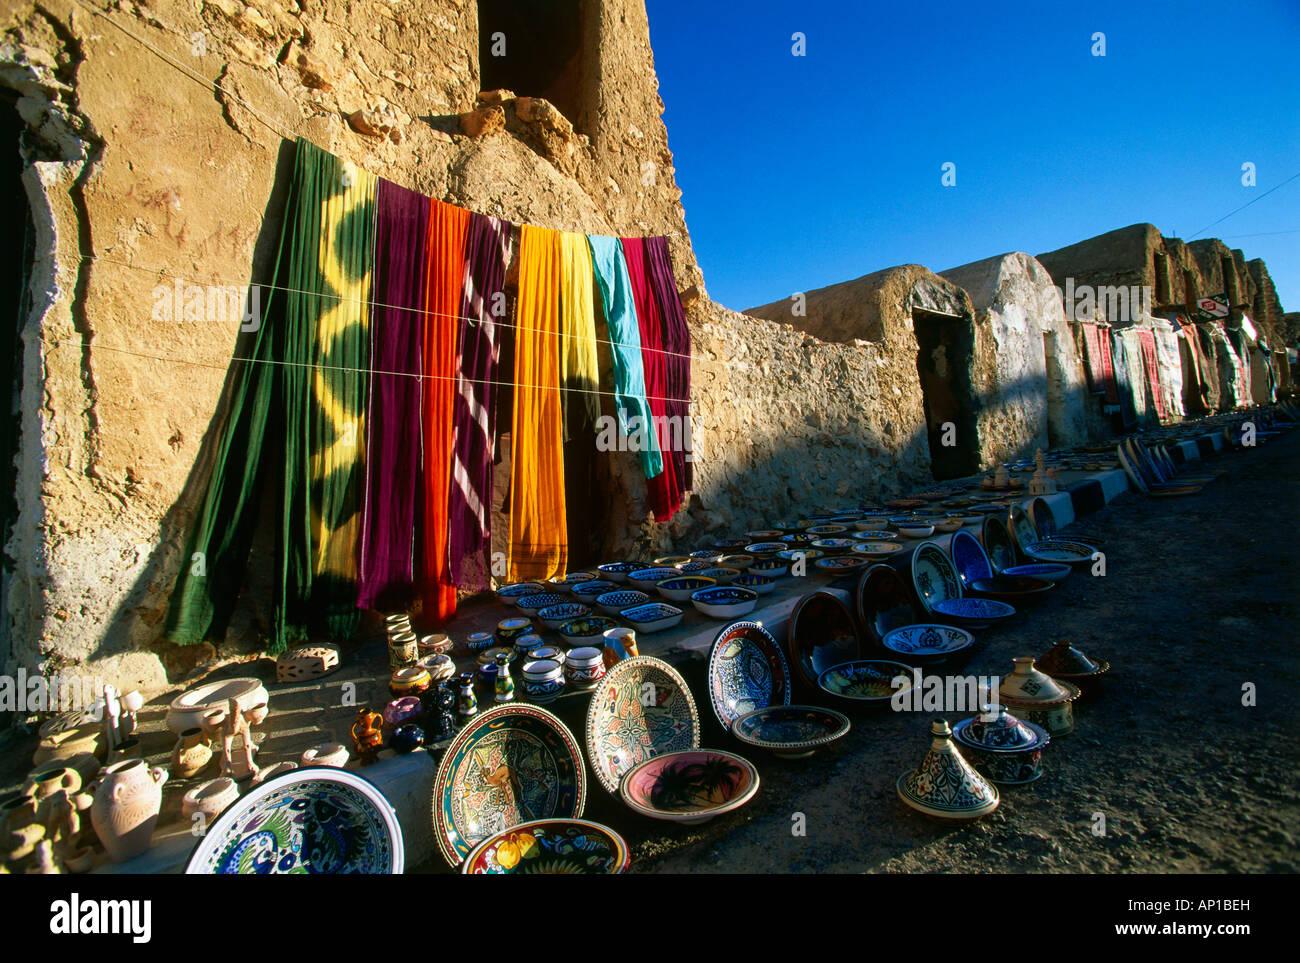 Souvenirs, former corn storage, Ghorfas Tunesia, Africa - Stock Image